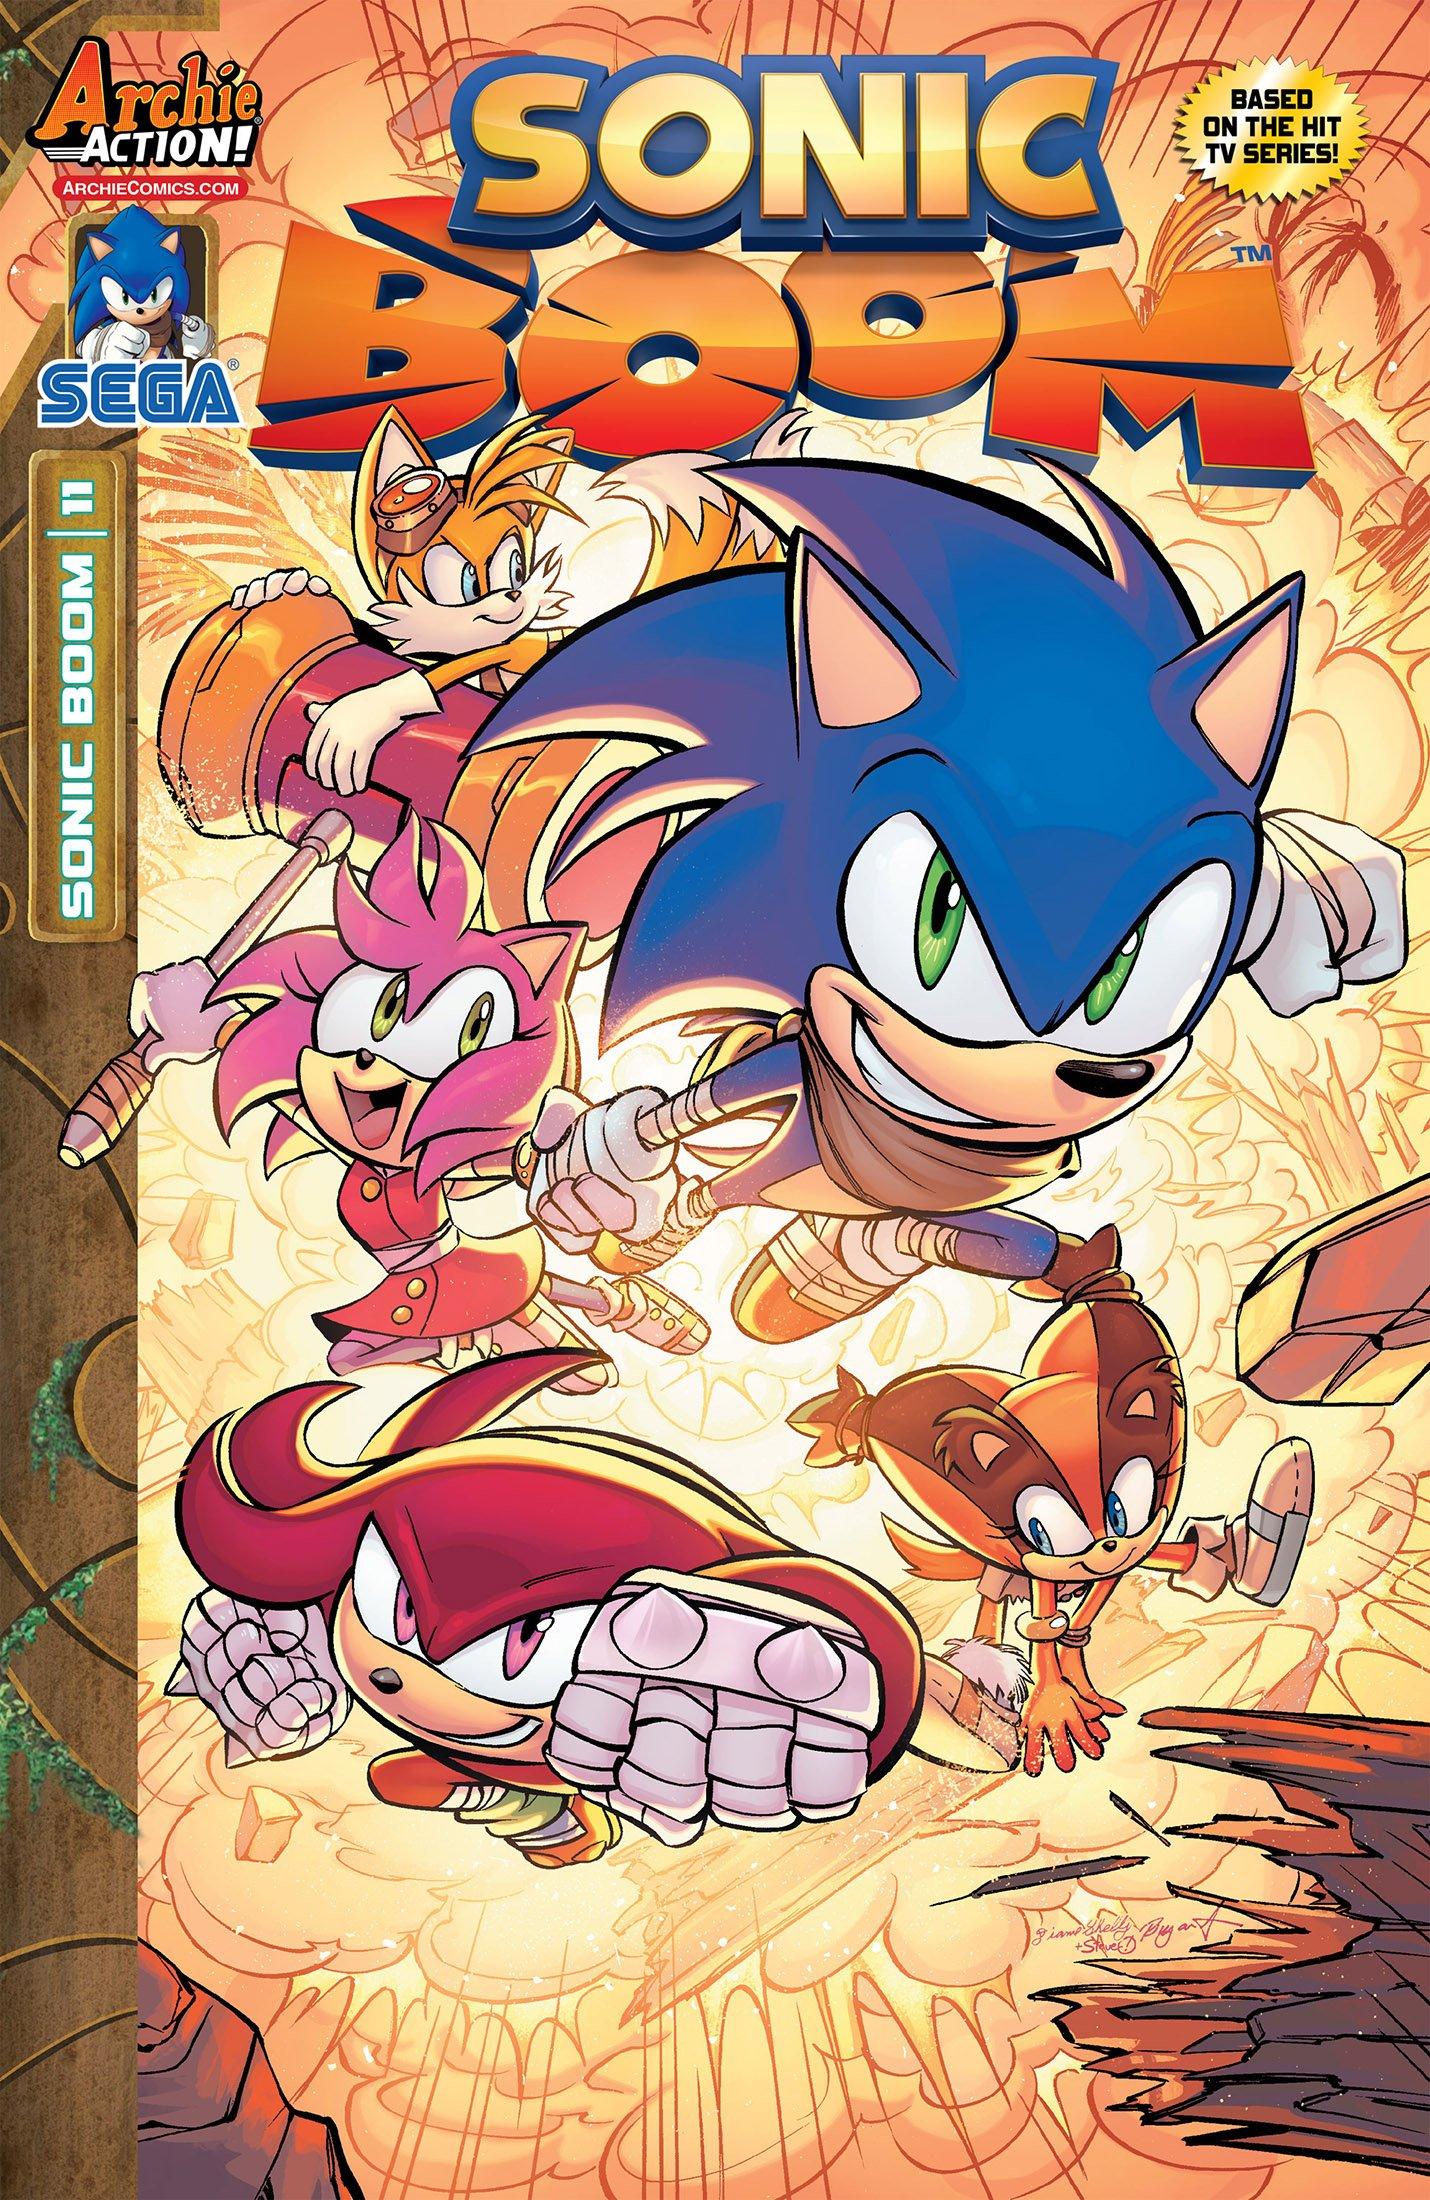 Sonic Boom 011 (October 2015)